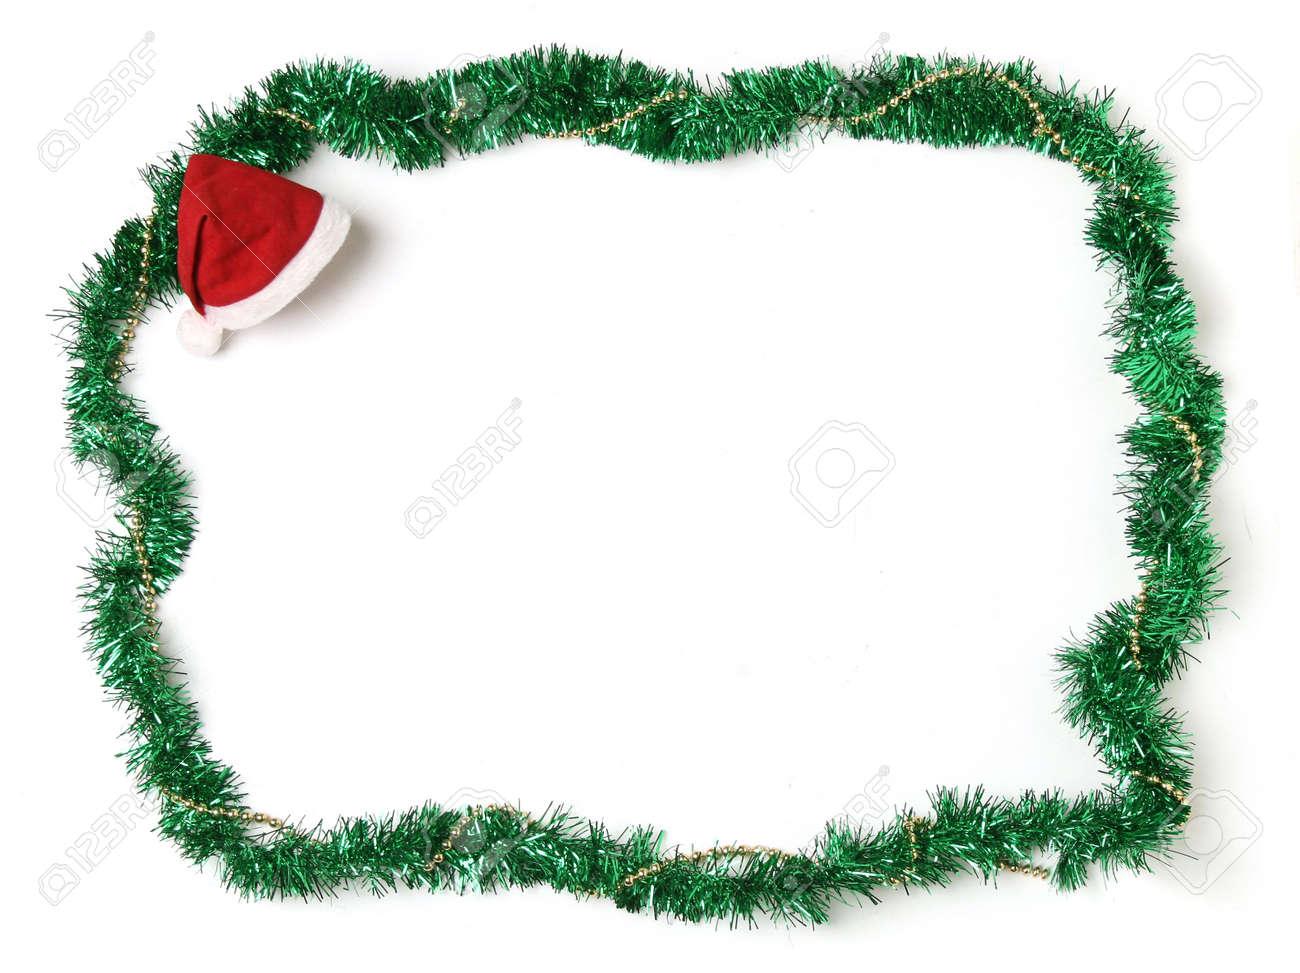 Christmas Ornament Rahmen Mit Nikolausmütze Lizenzfreie Fotos ...